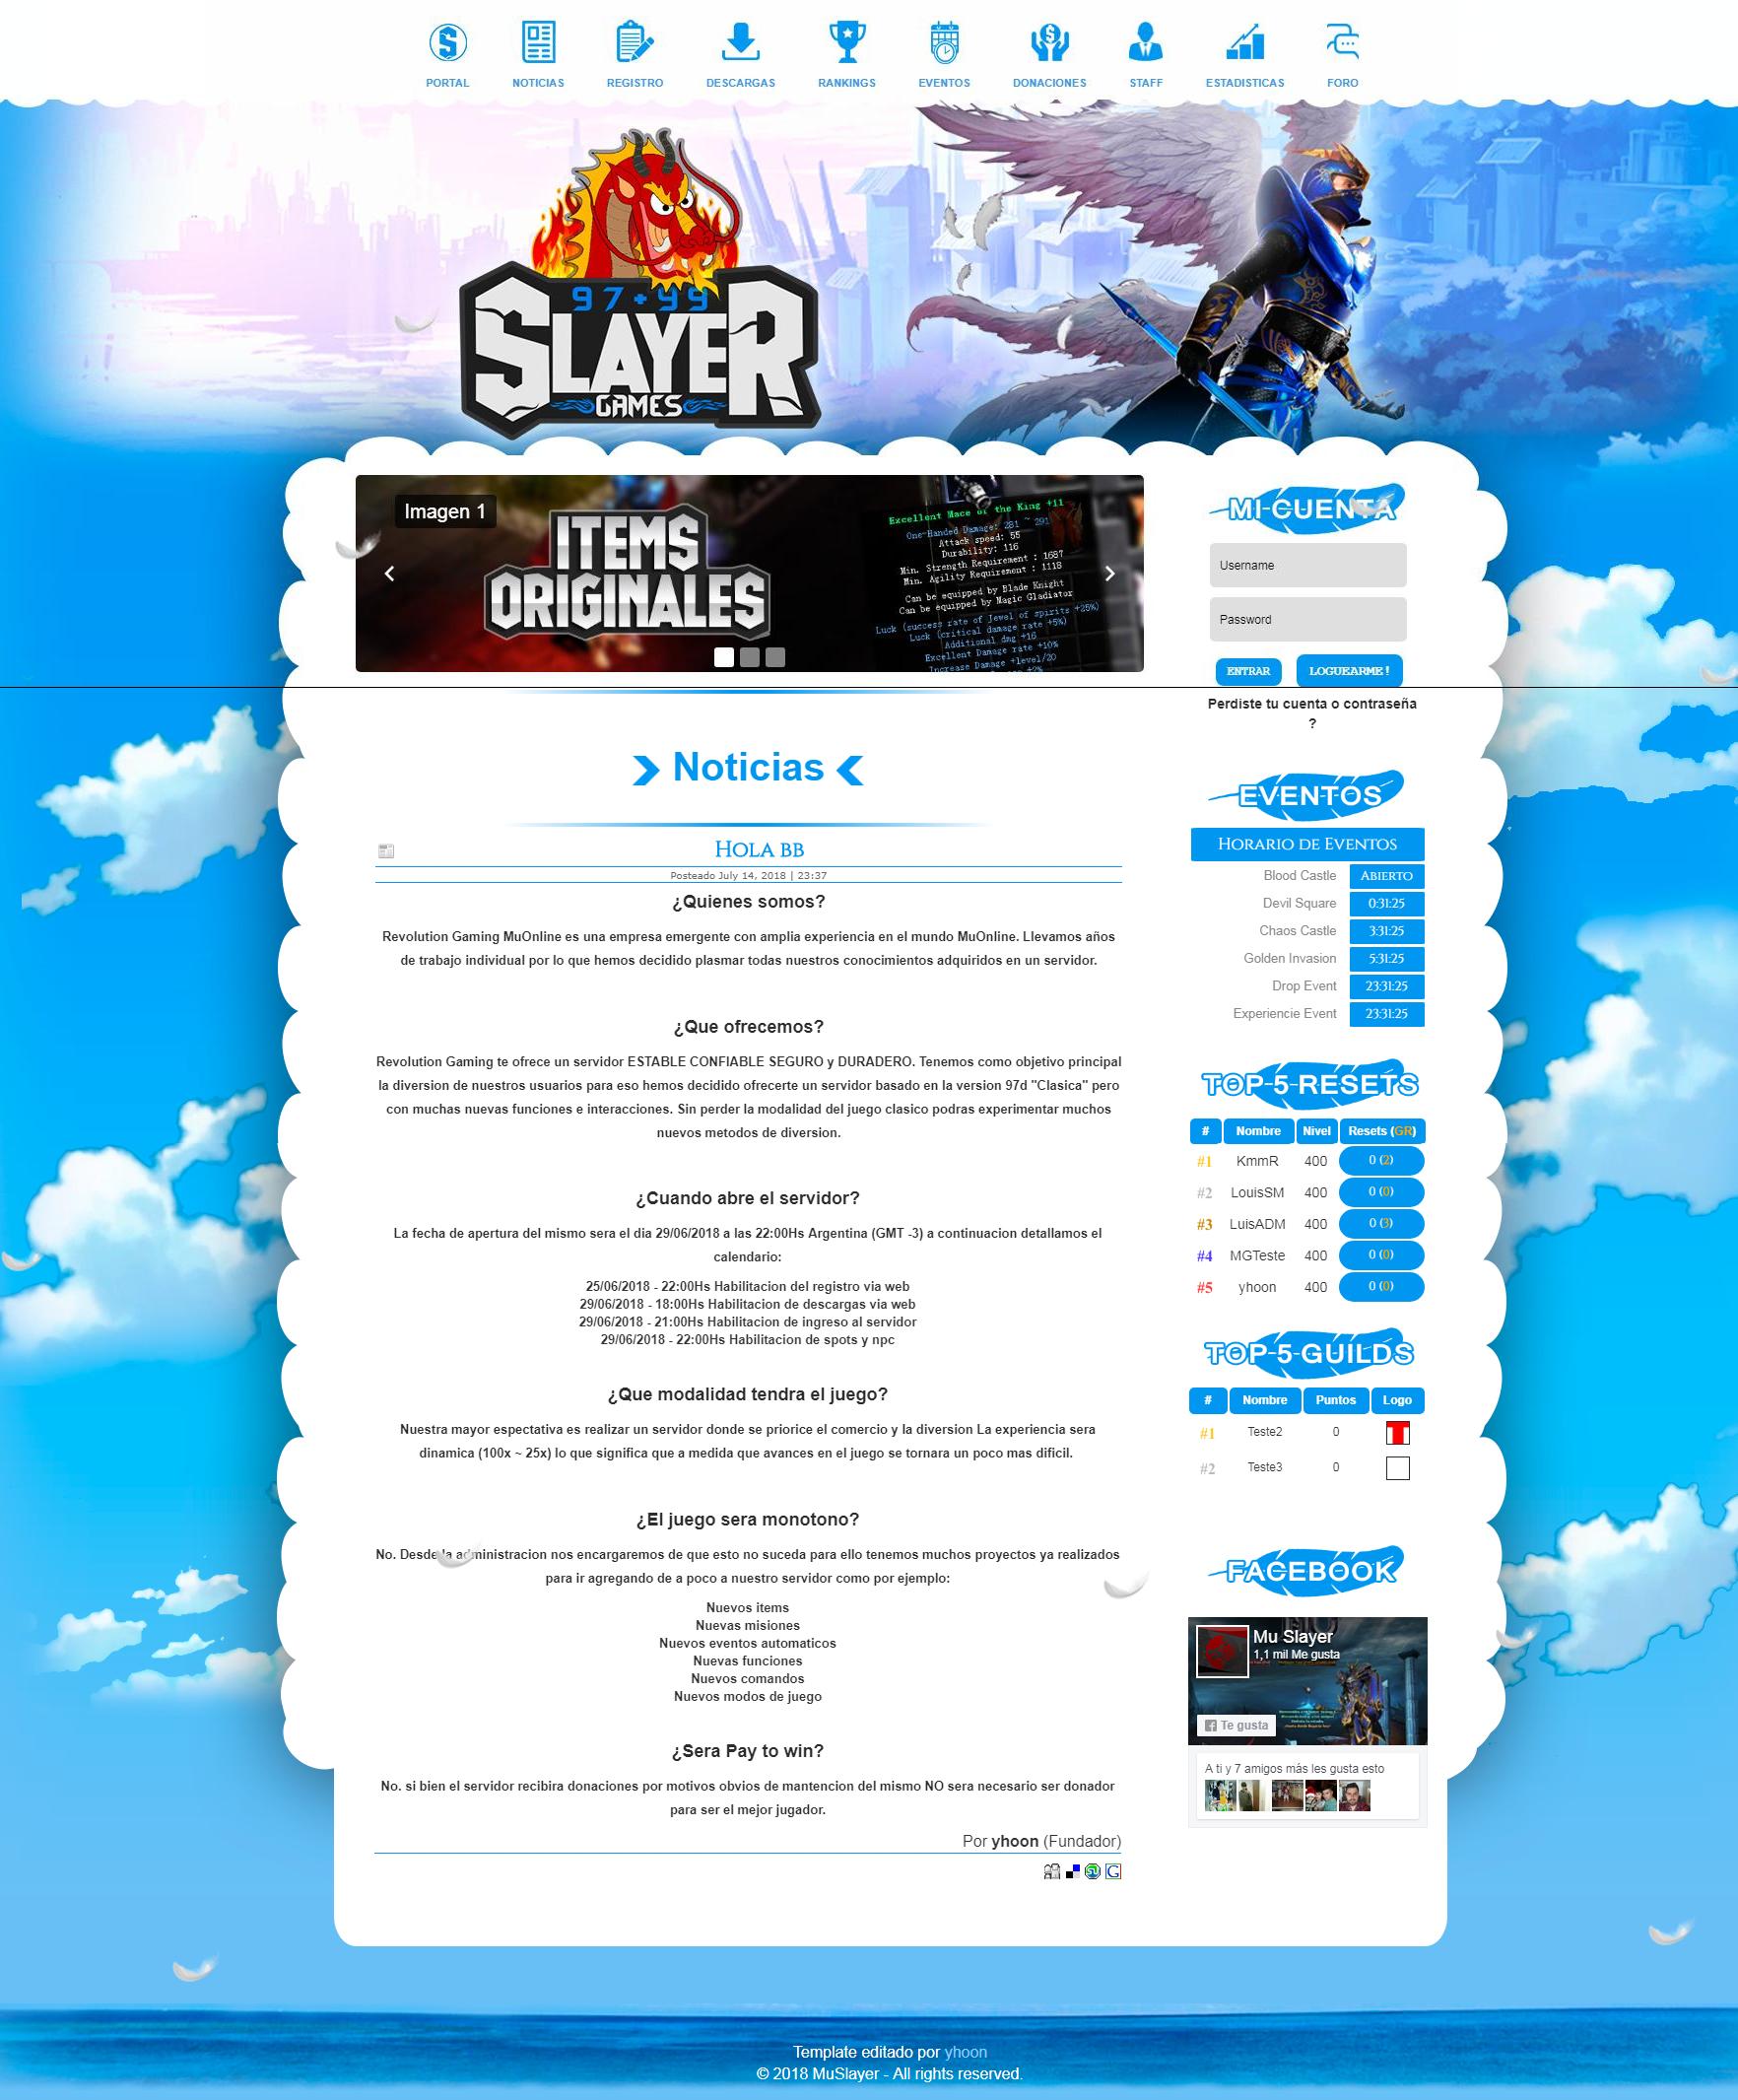 Web Destiny Mu Online MuCore 1,8, Baixar gratis, criar mu online pirata, criar servidor de mu online, o melhor portal de mu online do Brasil, Aprendiz mu online.